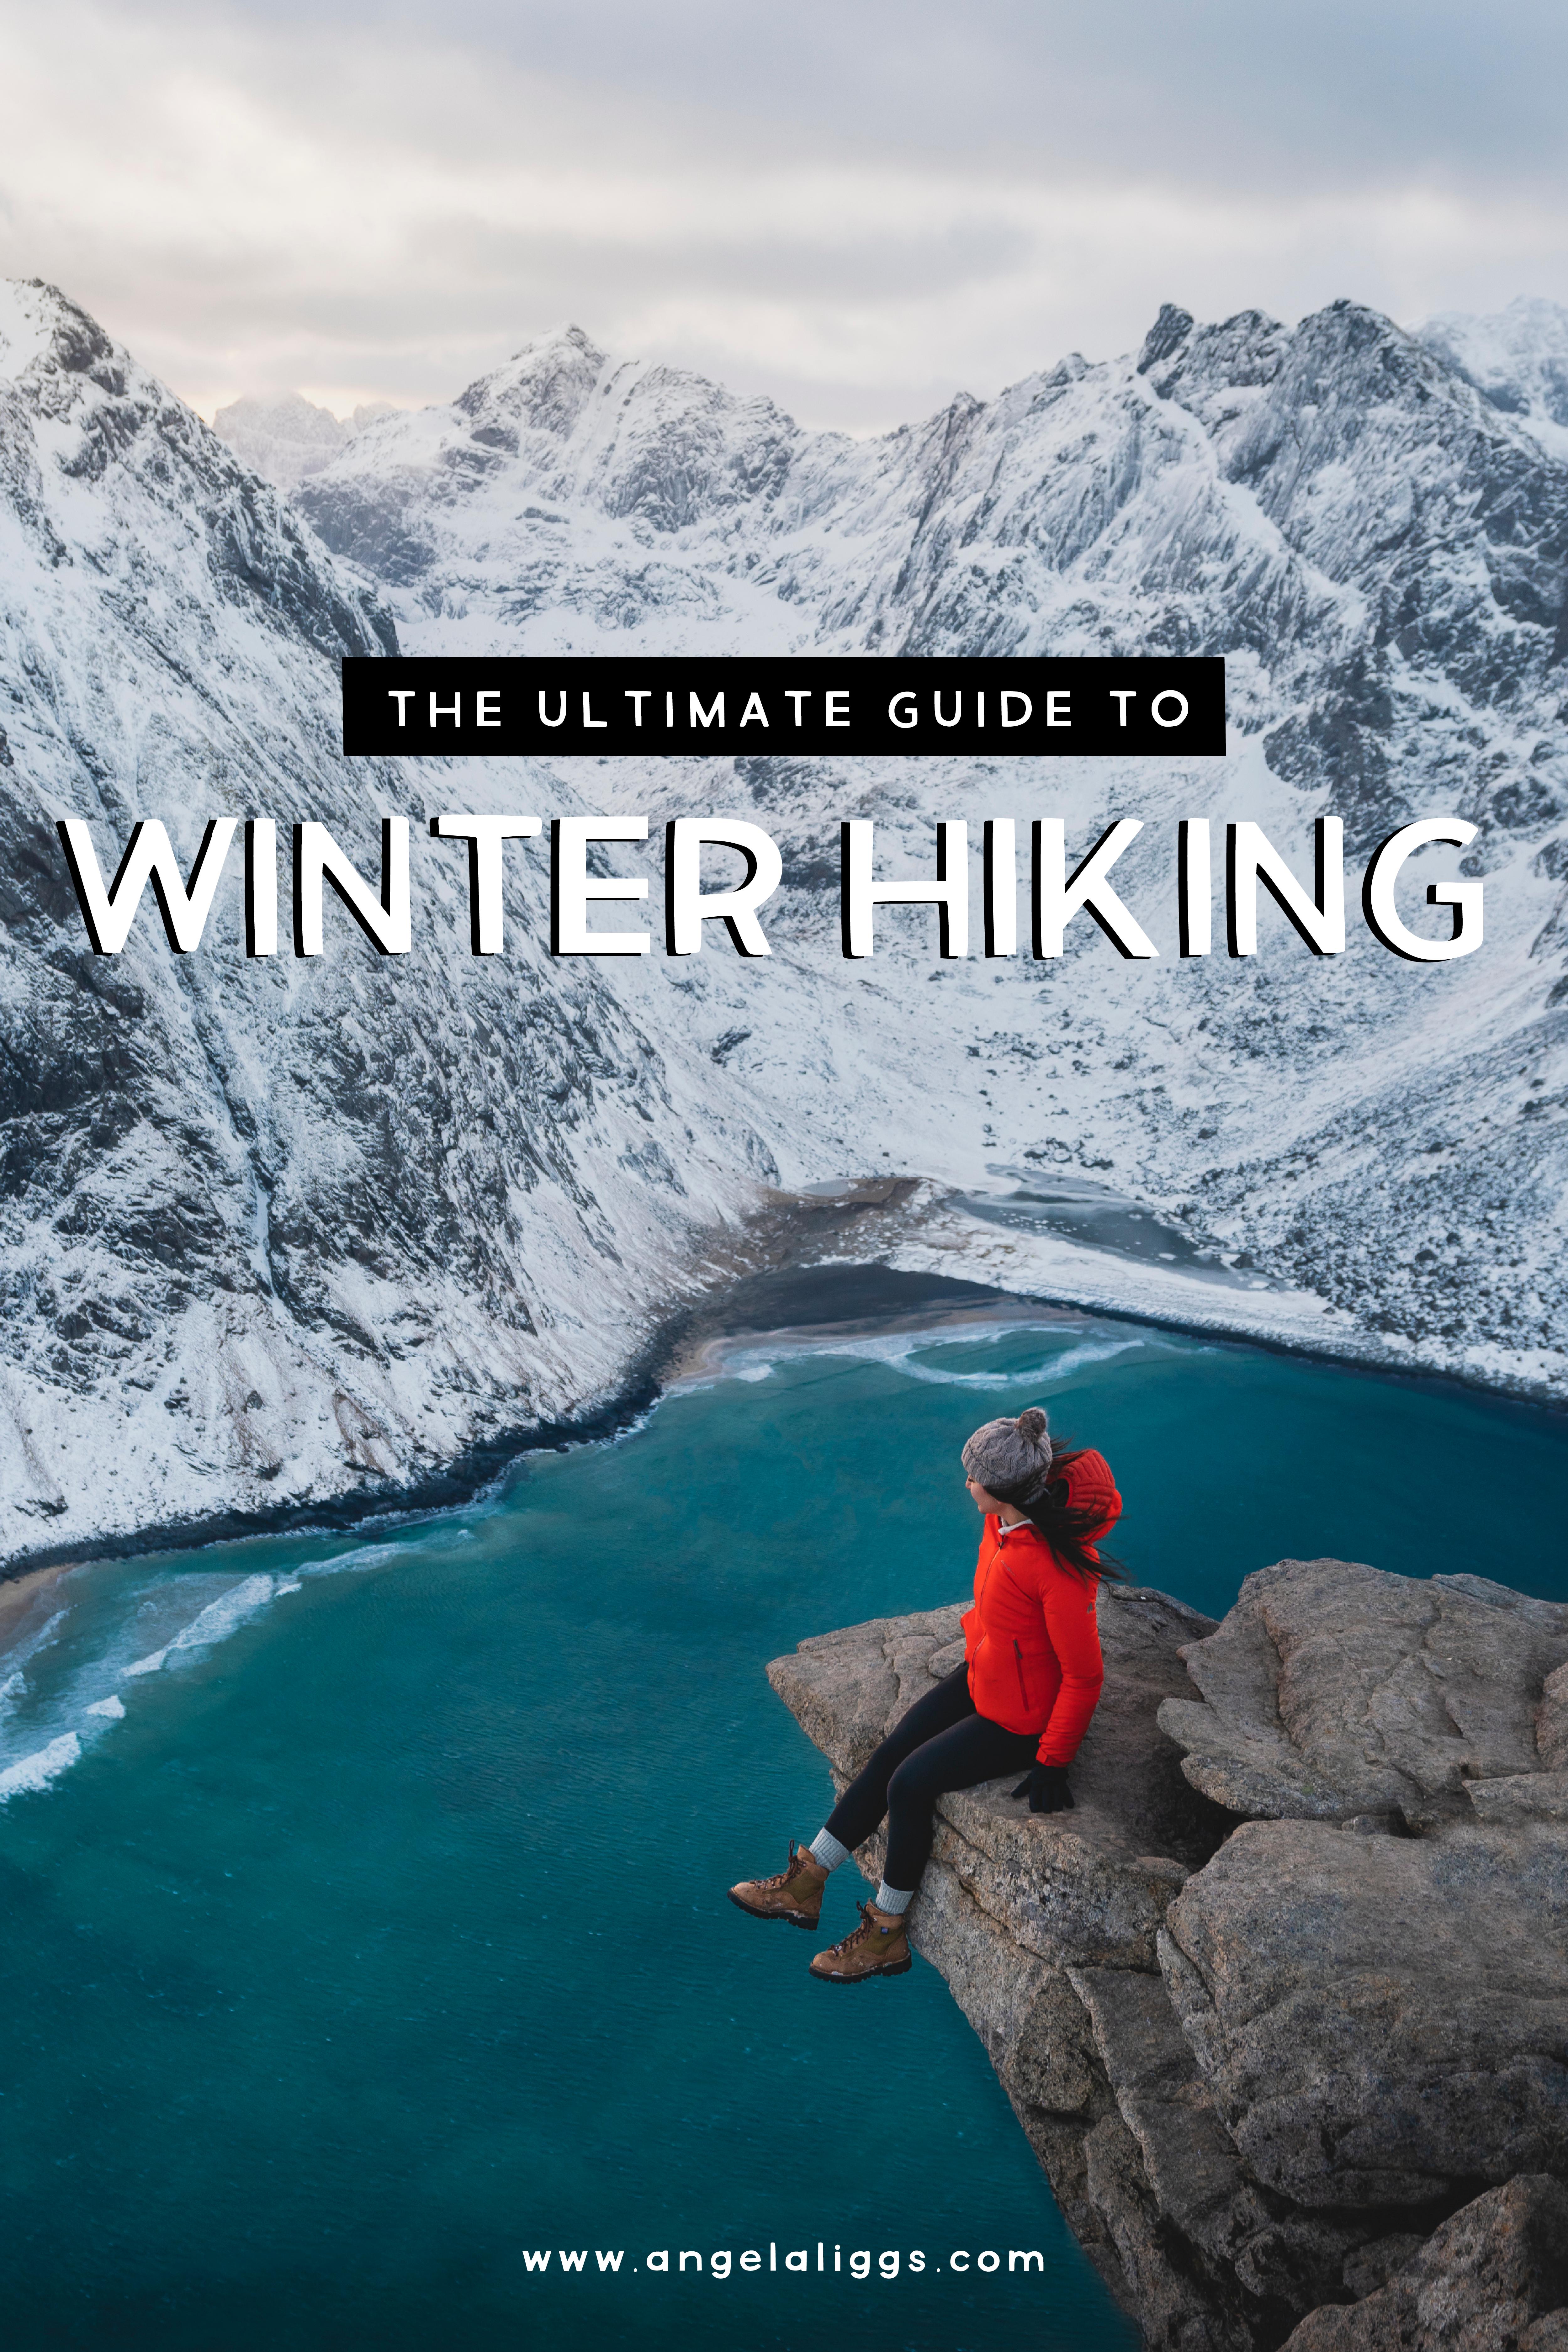 WinterHikingAngelaliggsWinterHikingBlog